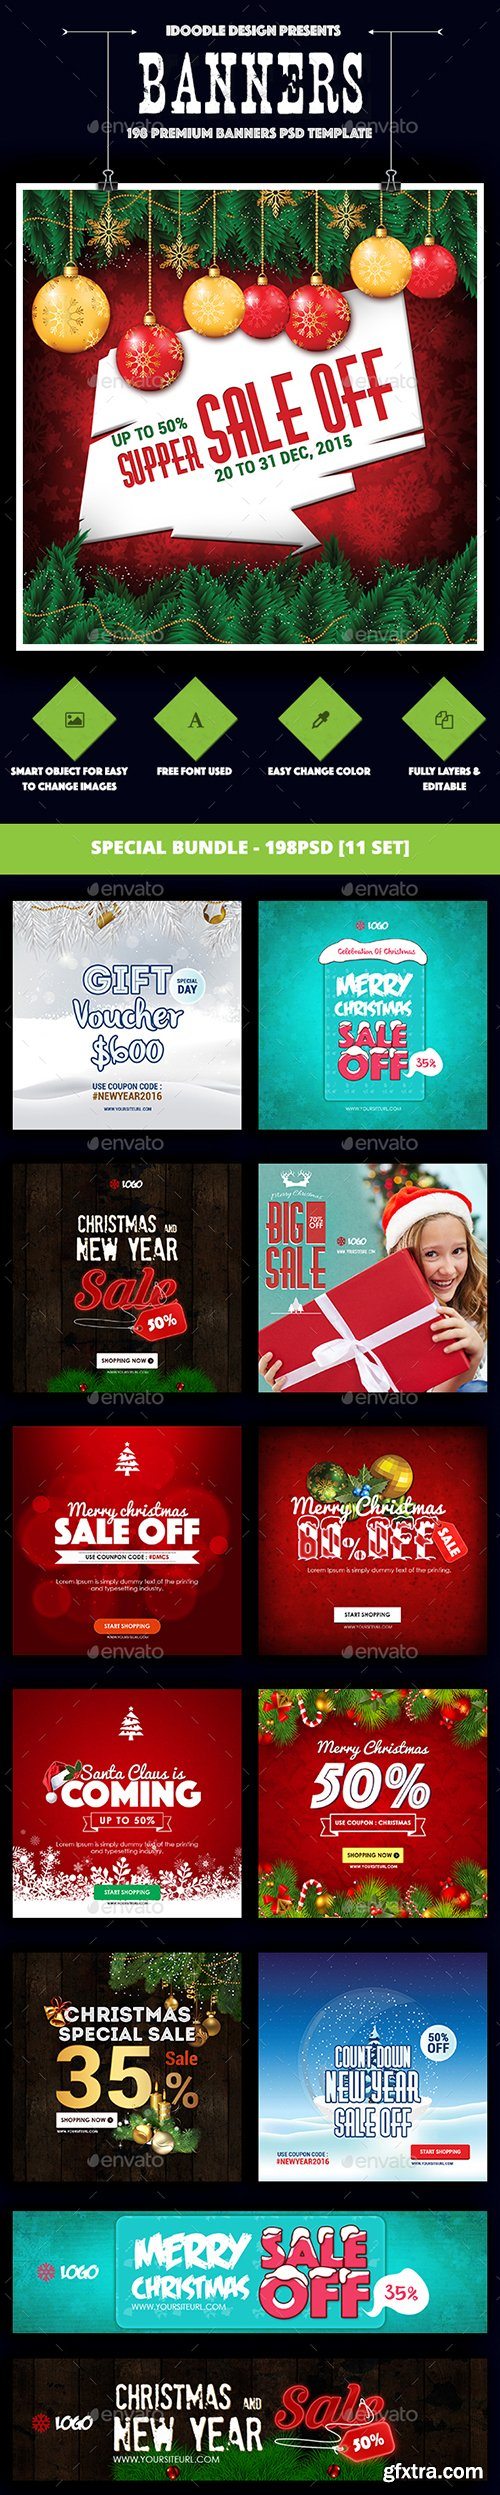 Graphicriver - [Special Bundle] Christmas Banners Ads - 198PSD [11 Set] 19130437